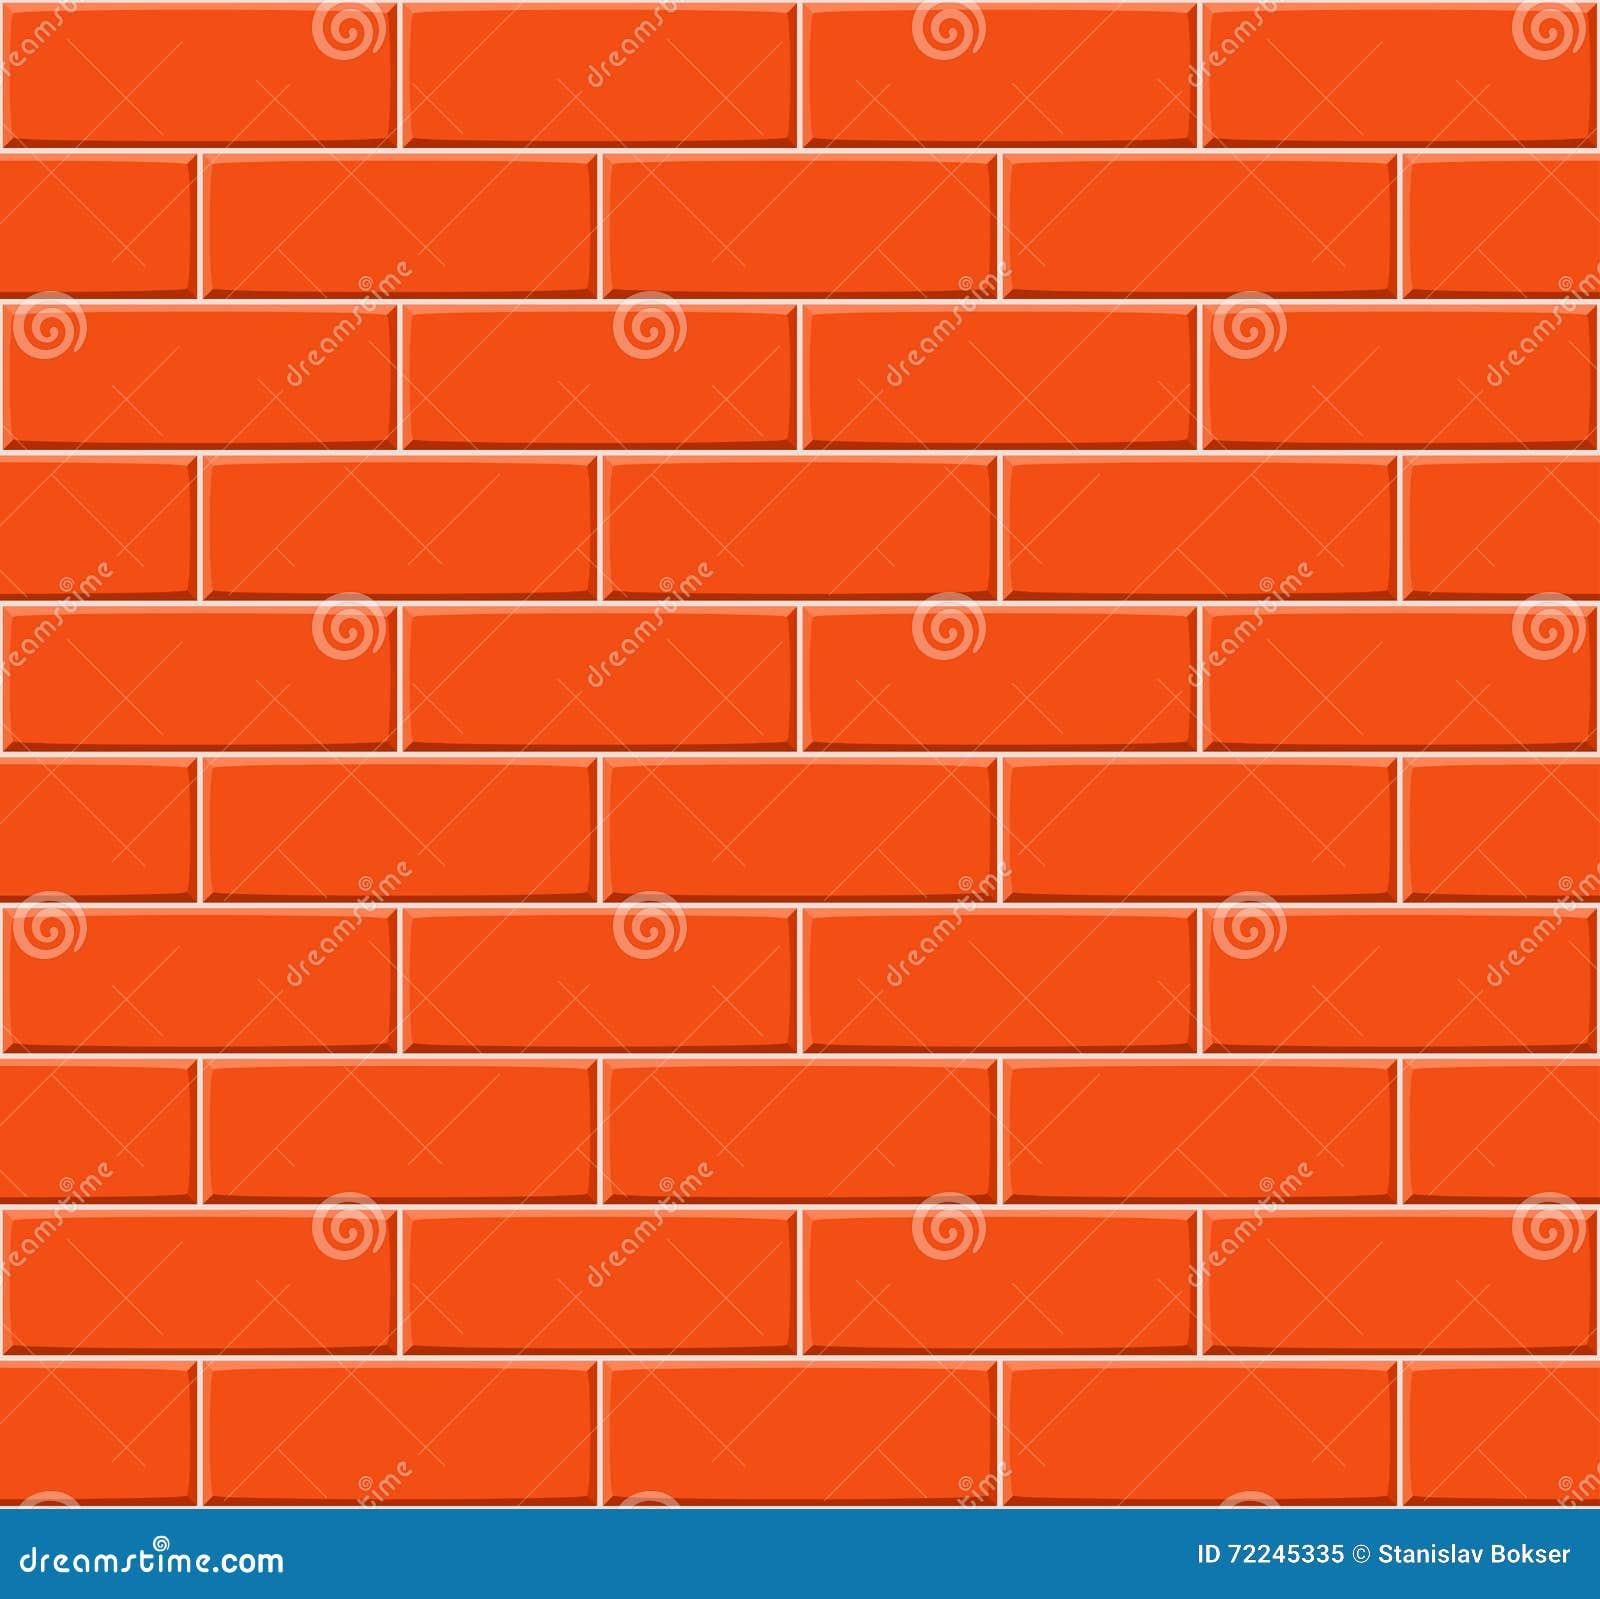 Cartoon Hand Drown Orange Seamless Brick Wall Texture